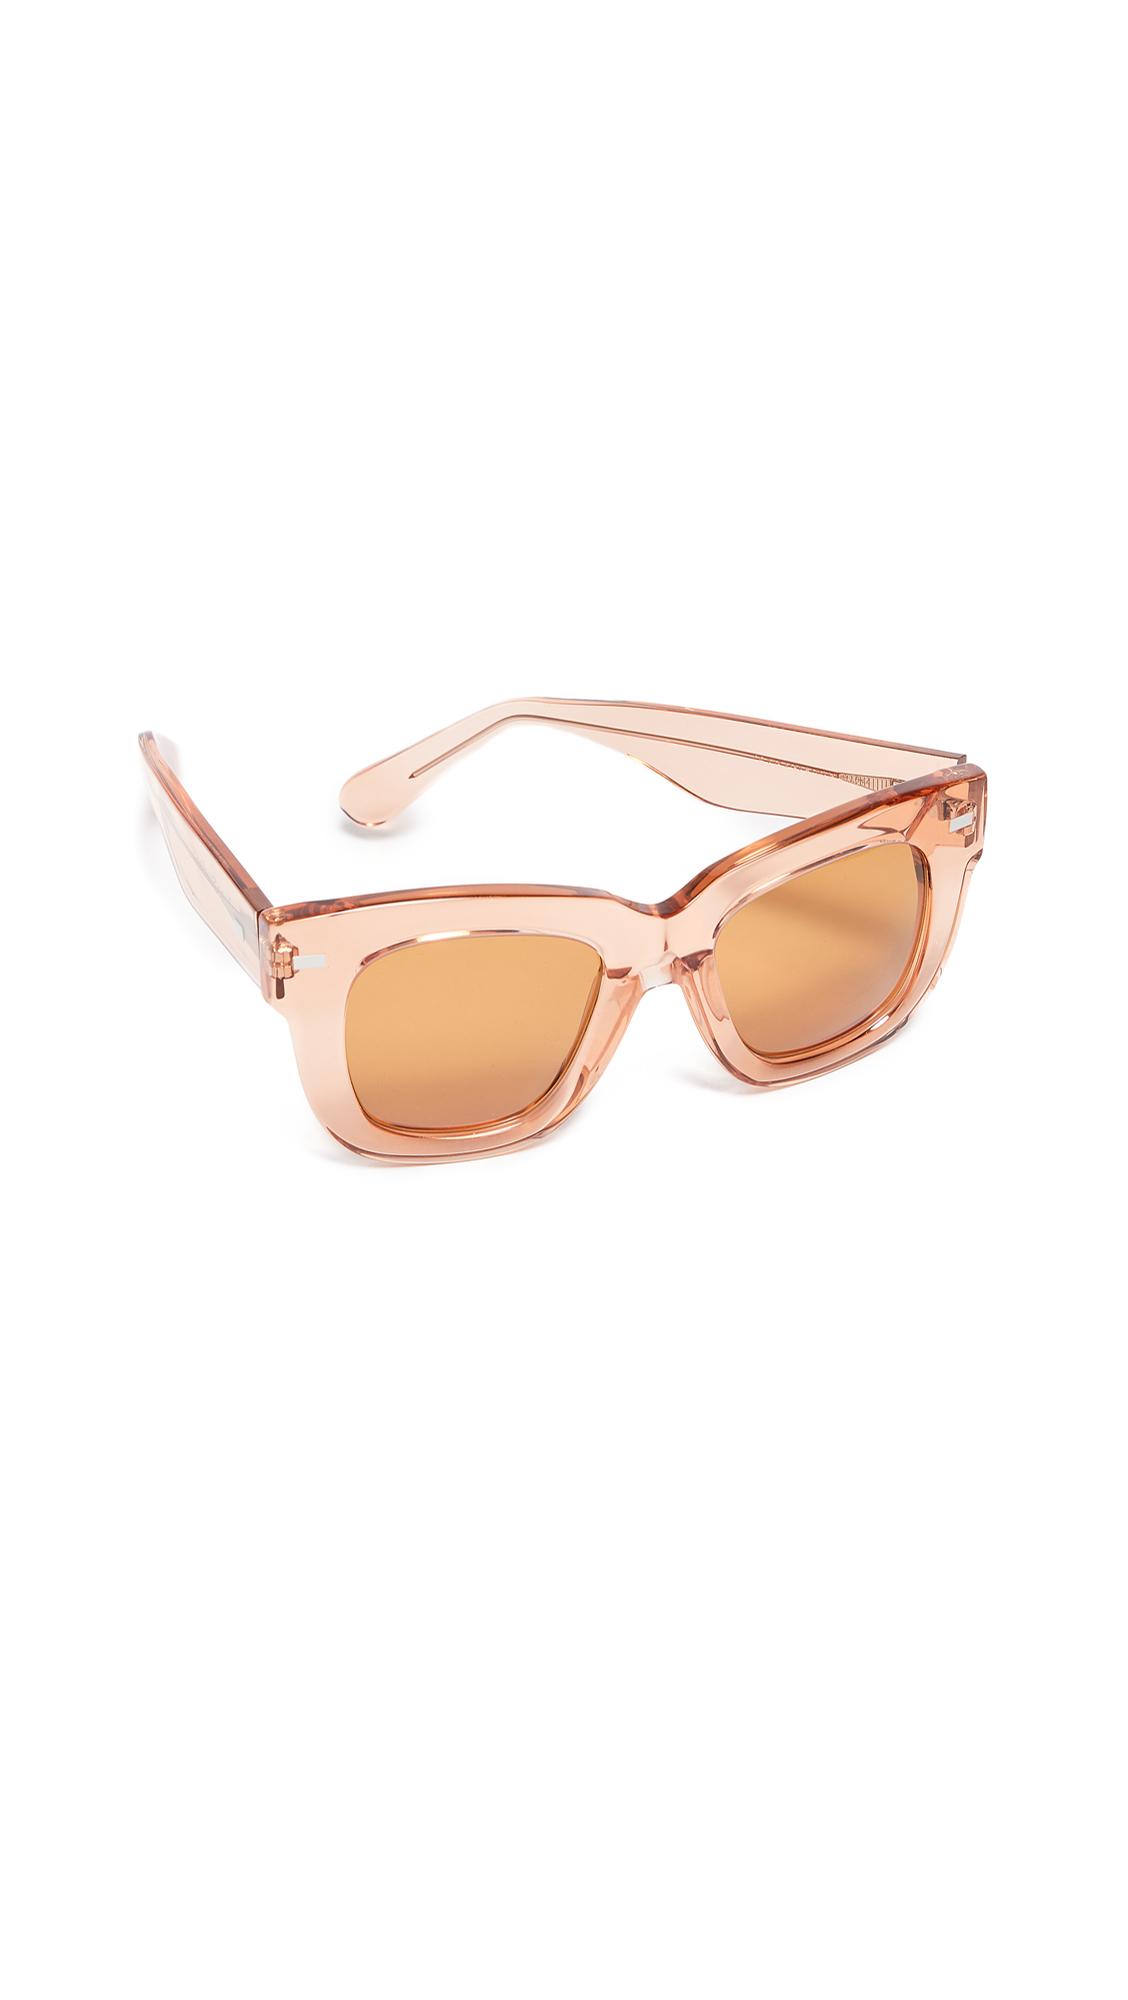 Acne Studios Library Sunglasses - Orange